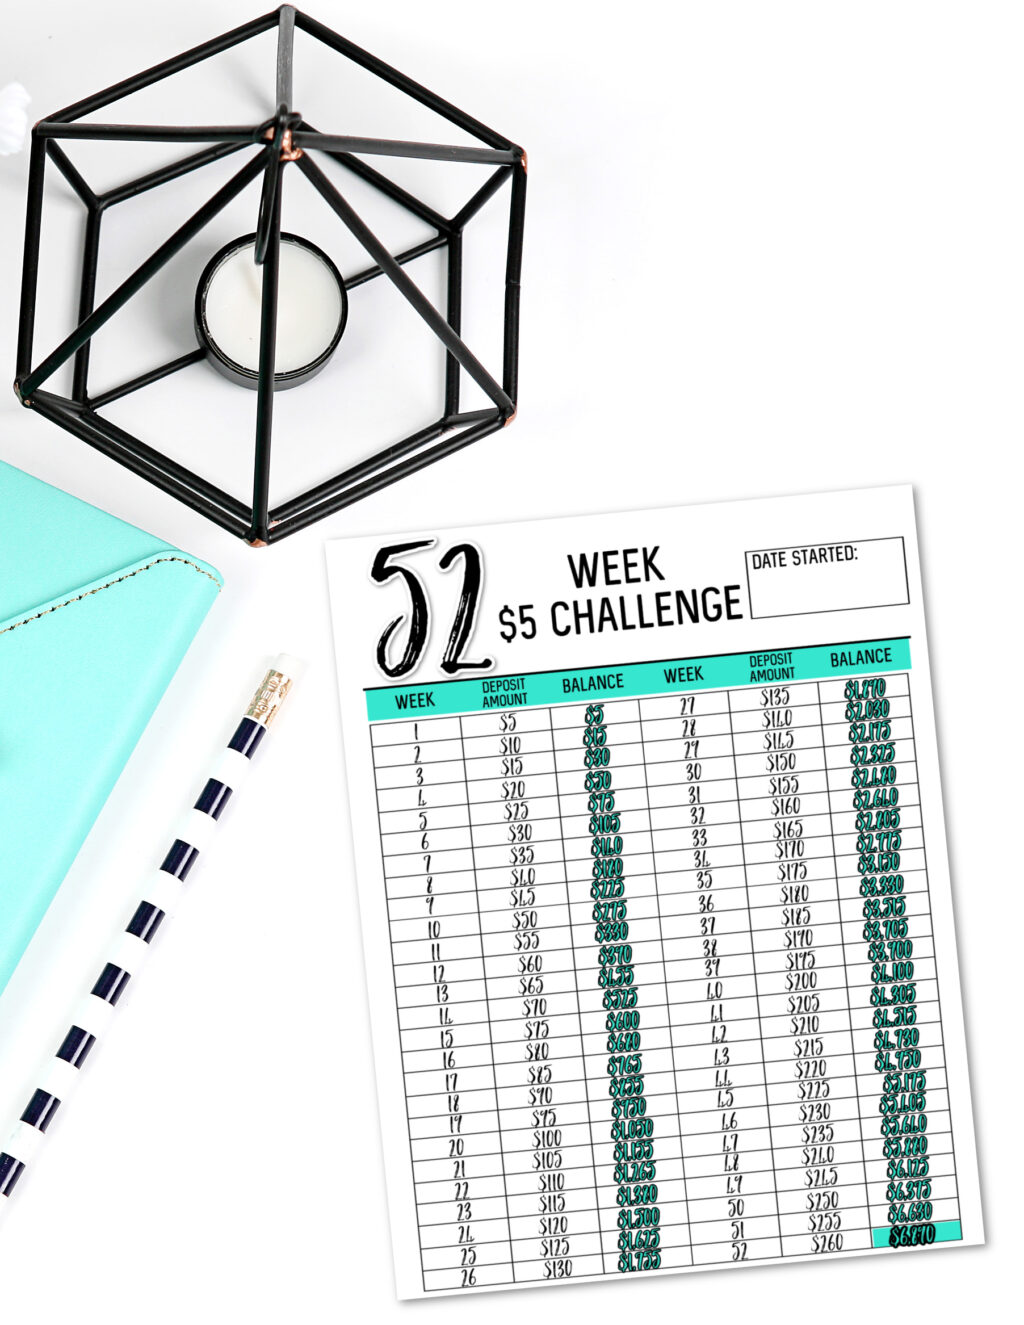 52 week $5 challenge